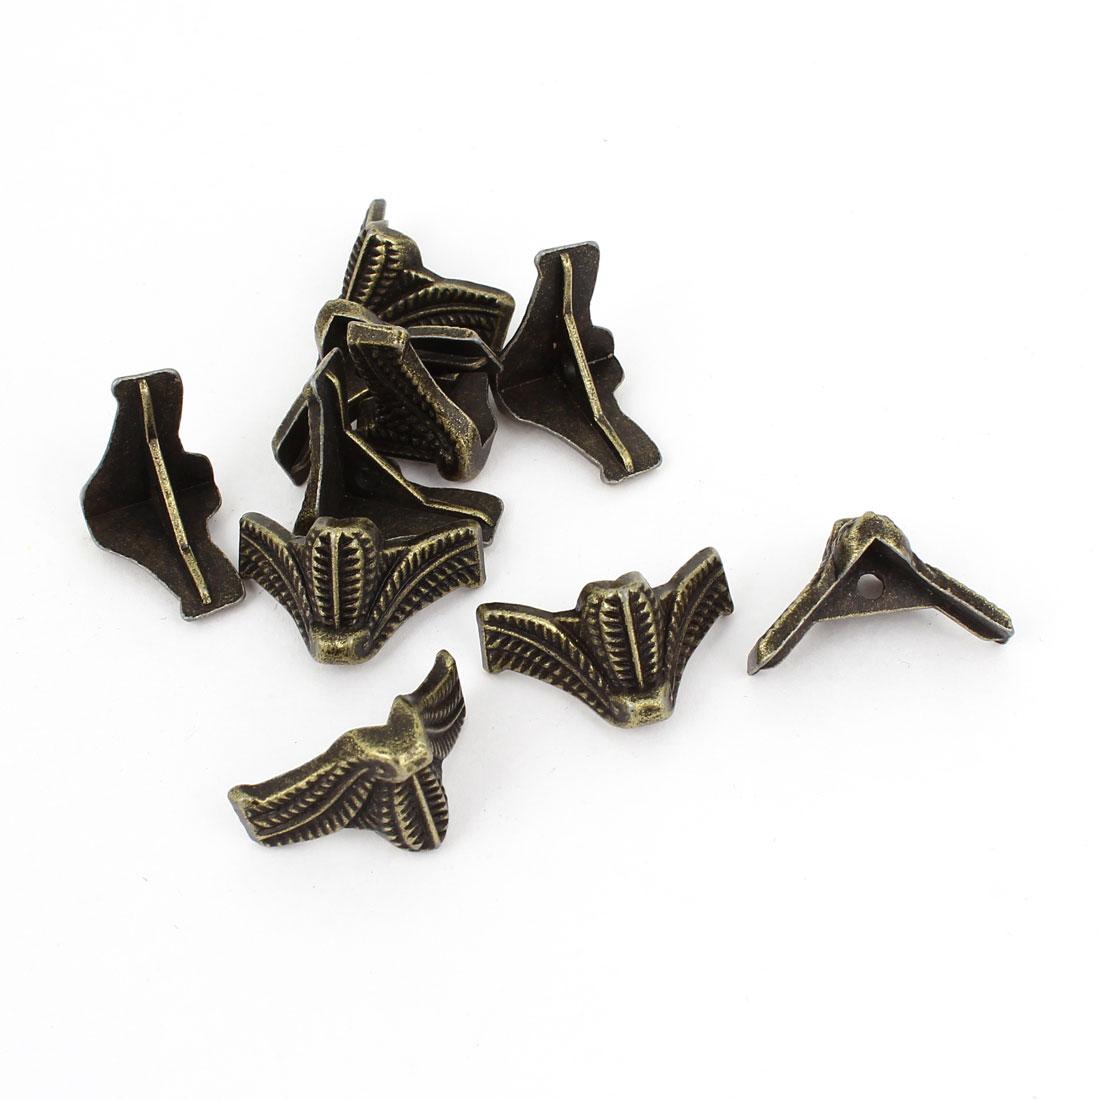 10 Pcs 18mm x 18mm x 15mm Vintage Style Corner Angle Brackets Braces Bronze Tone